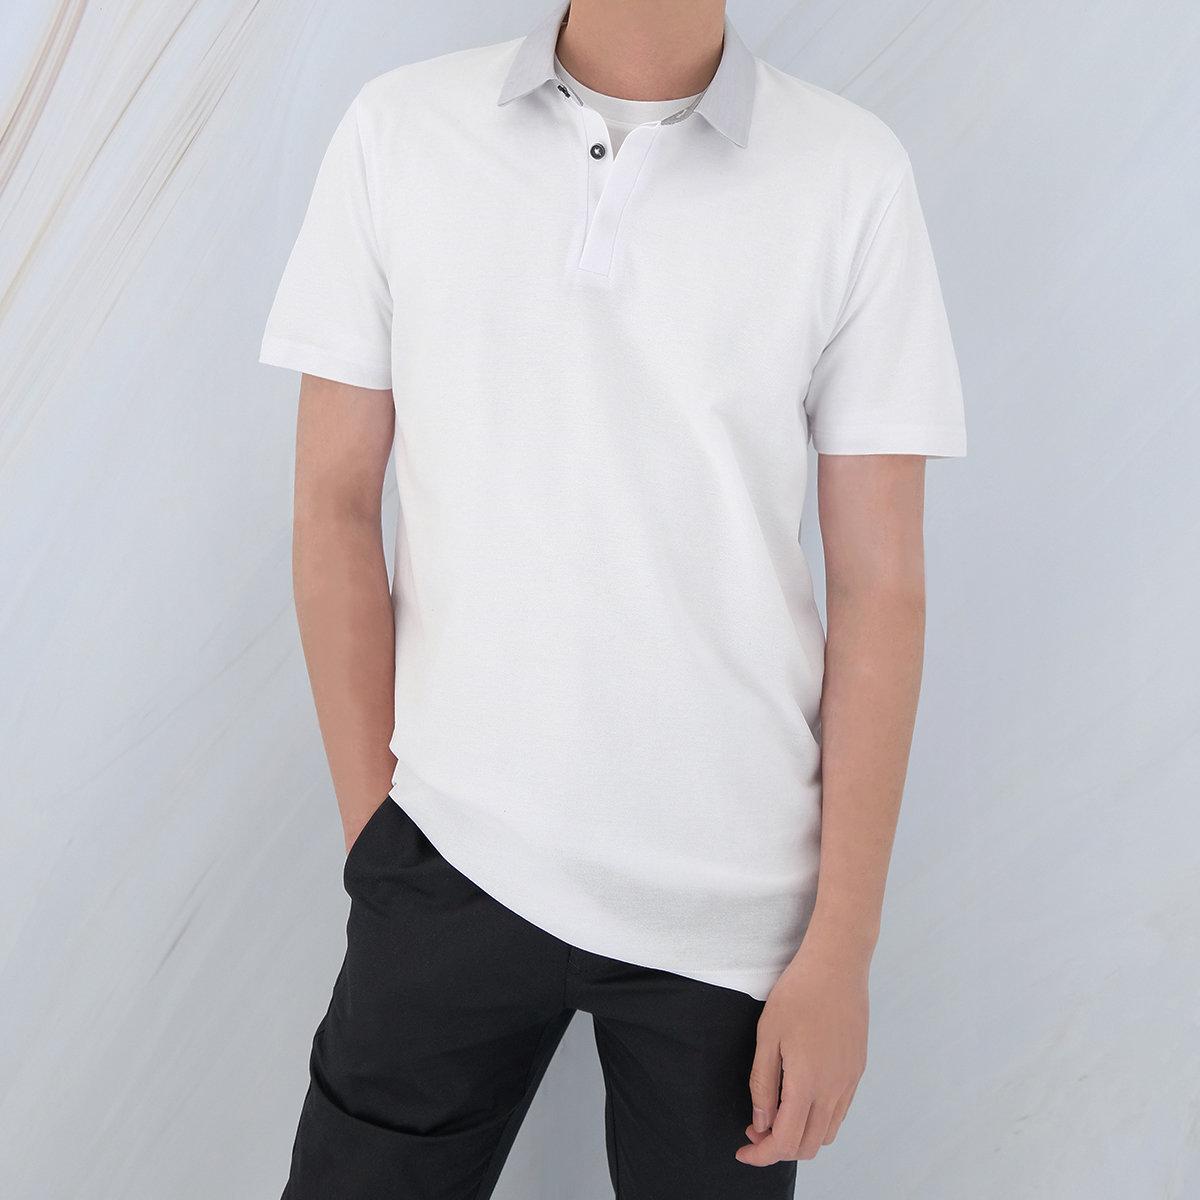 Men's Cotton Blend Polo Shirt (White)